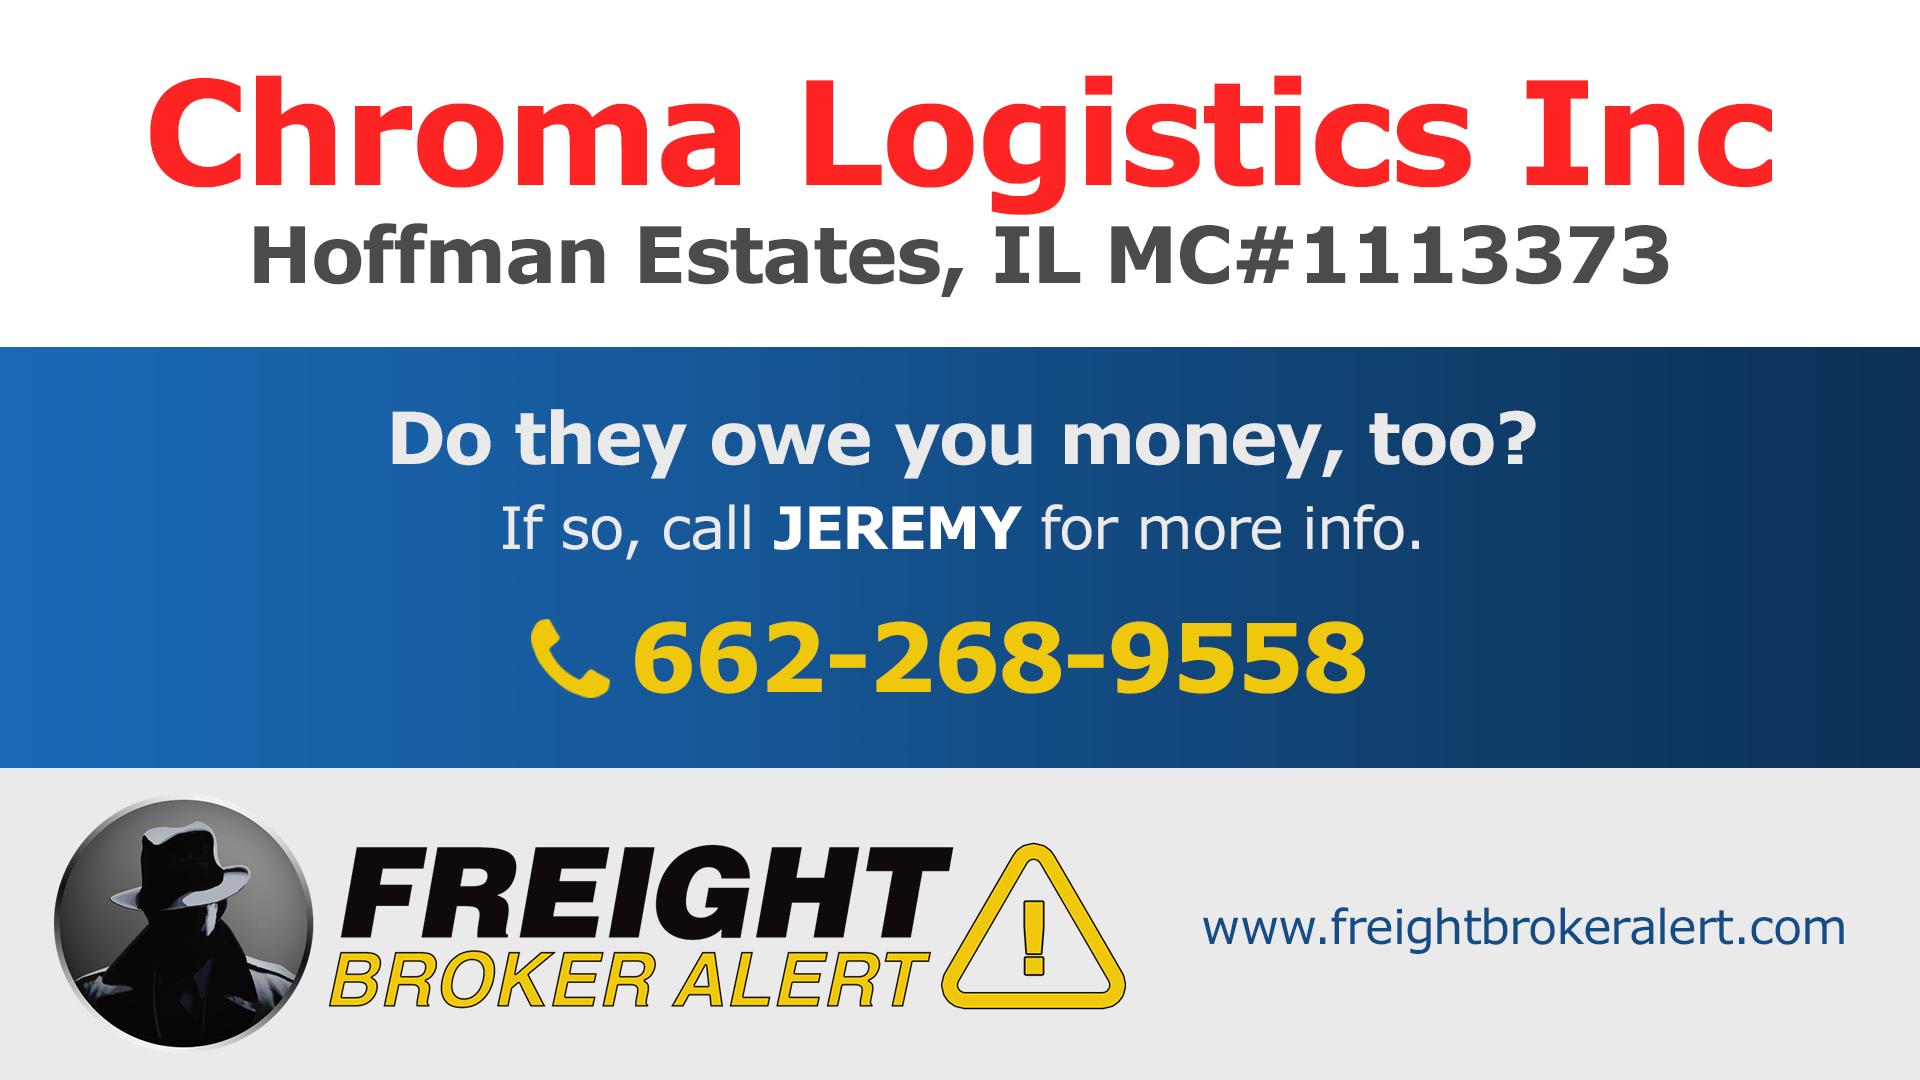 Chroma Logistics Inc Illinois